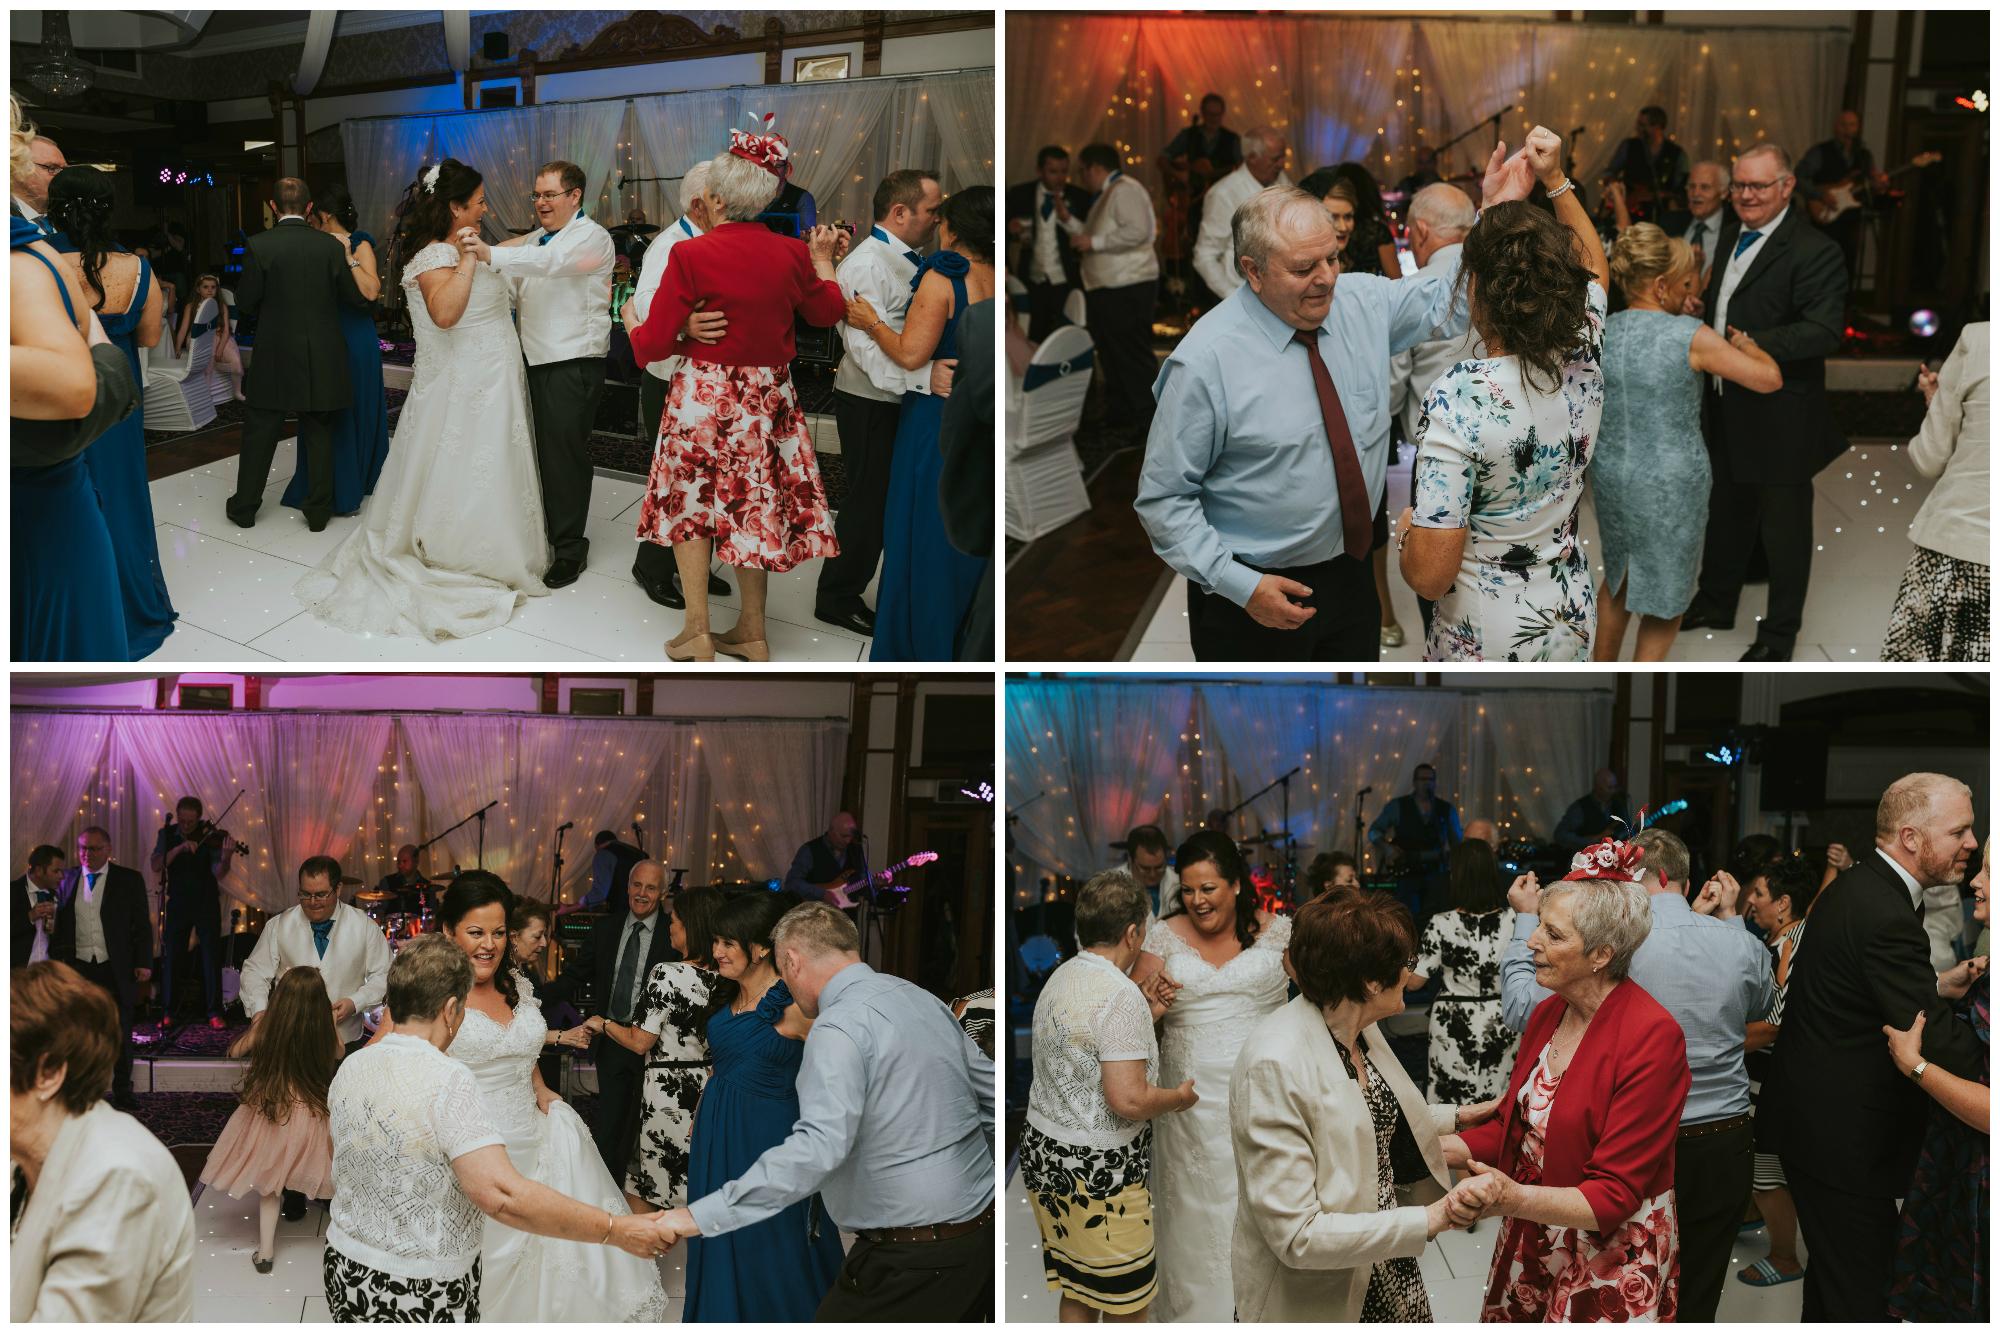 Balmoral Hotel Belfast wedding photographer Pure Photo N.I guests dancing